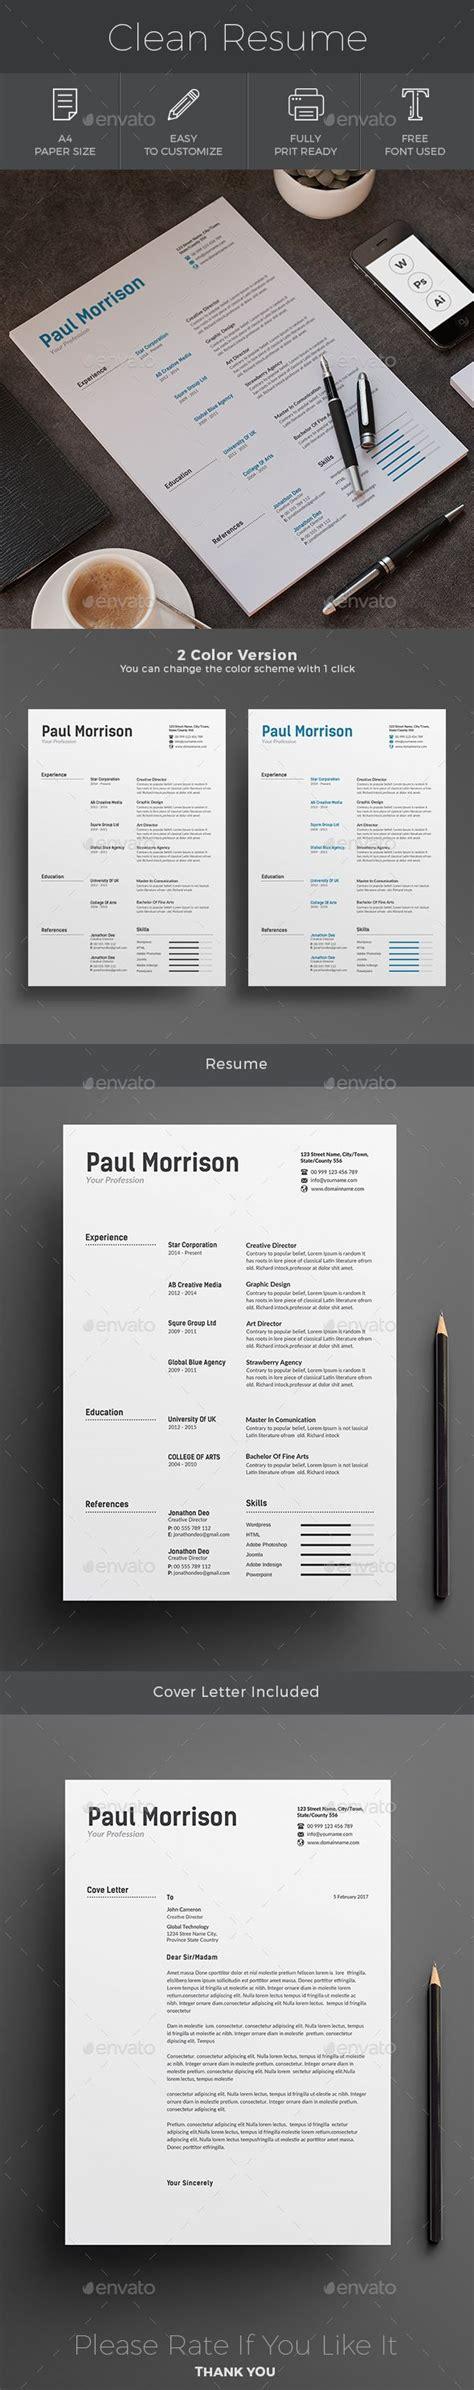 simple resume template vol 6 psd template 25 best ideas about simple resume template on simple cv format simple cv template